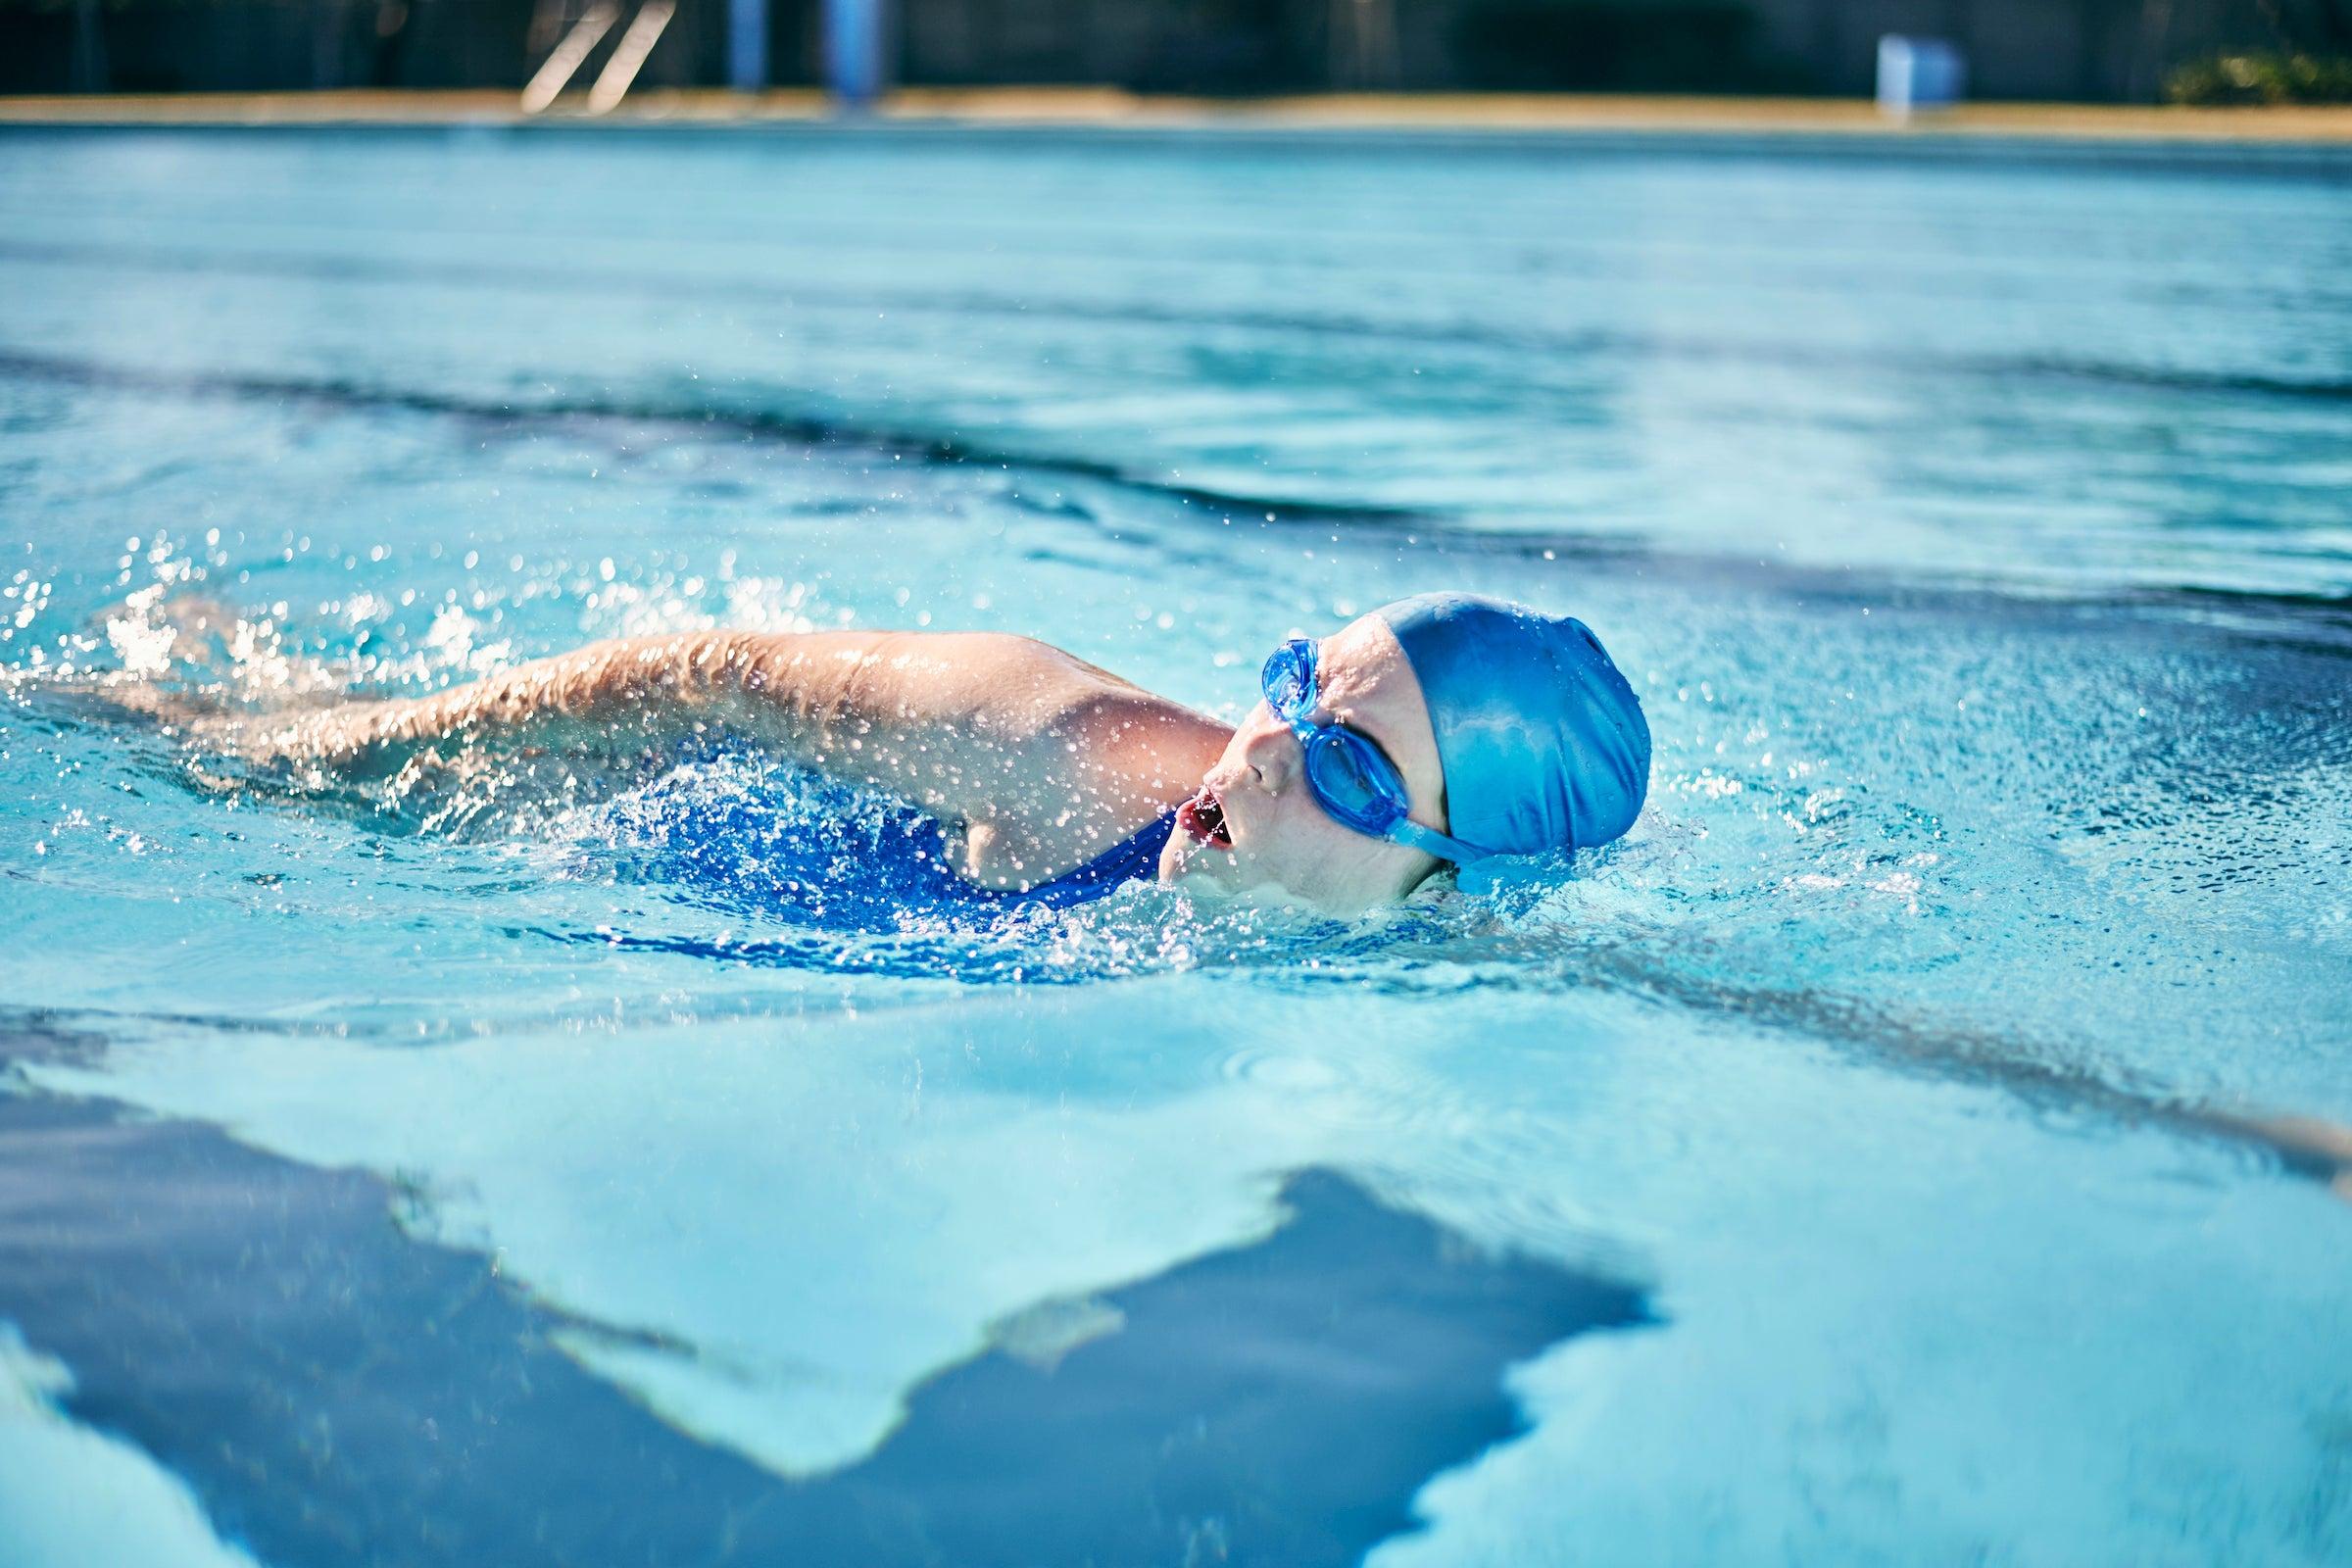 Safety Tips for Swimming During Coronavirus Outbreak